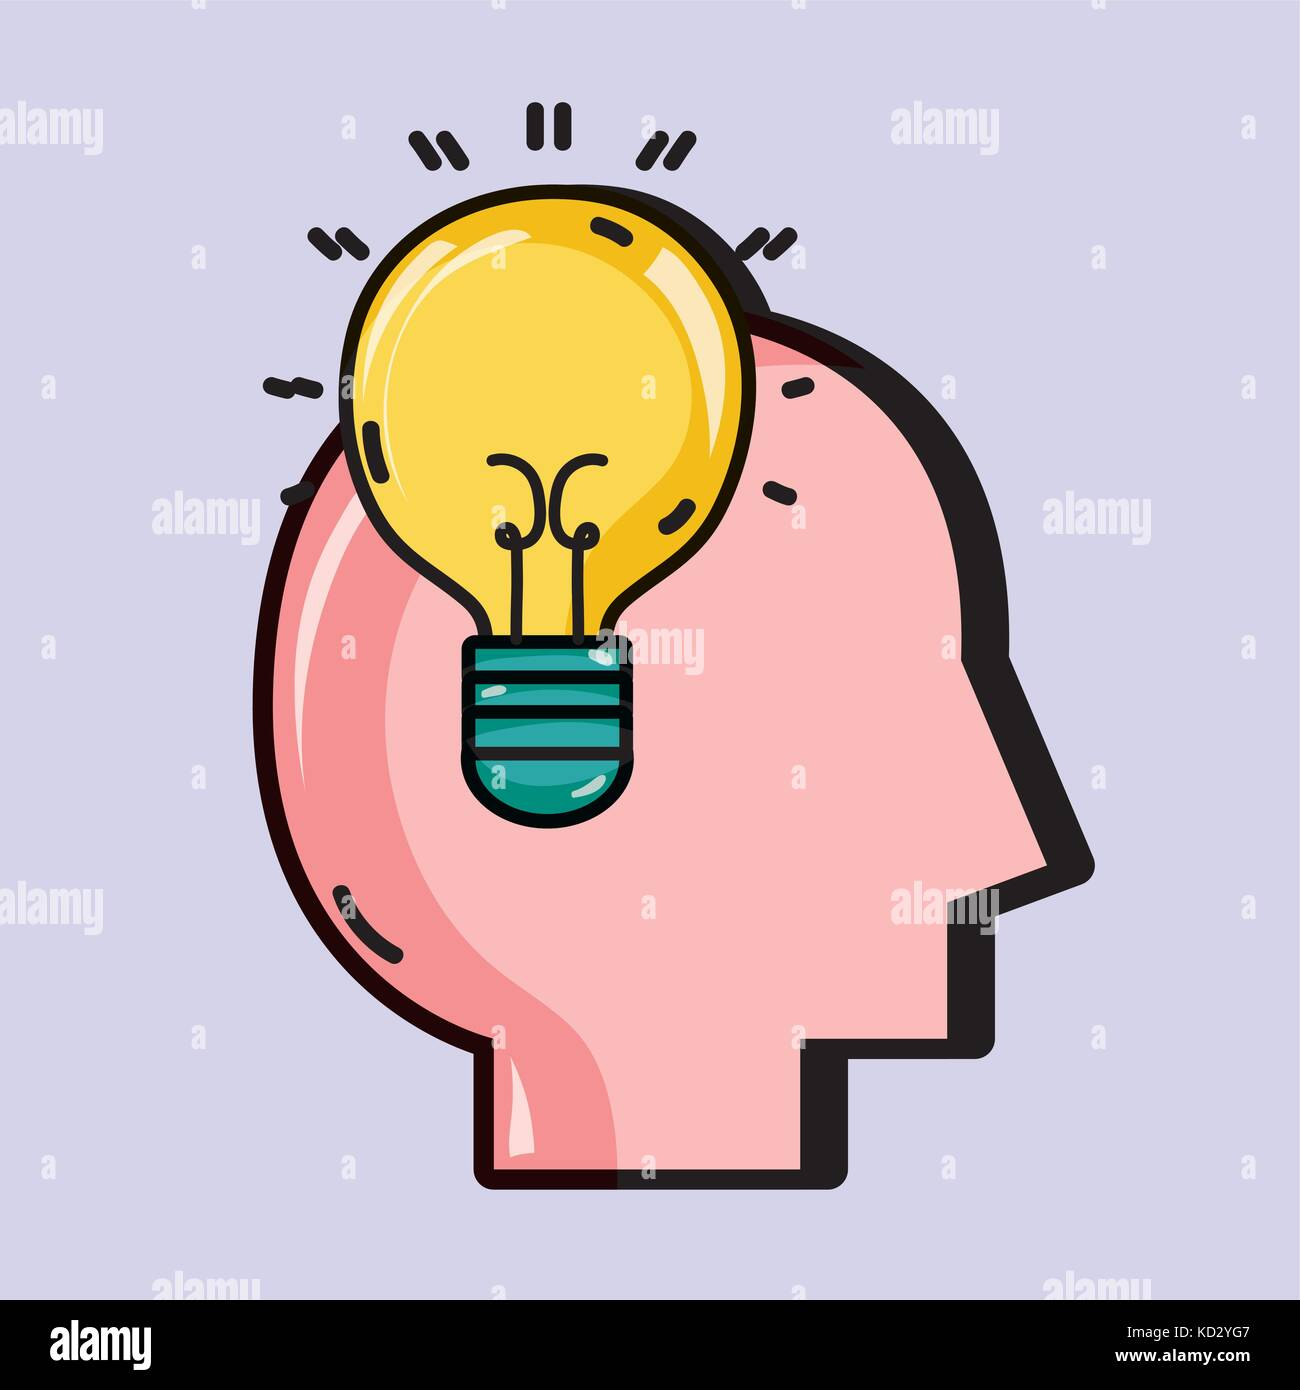 psychology treatment to analysis mental problem - Stock Image